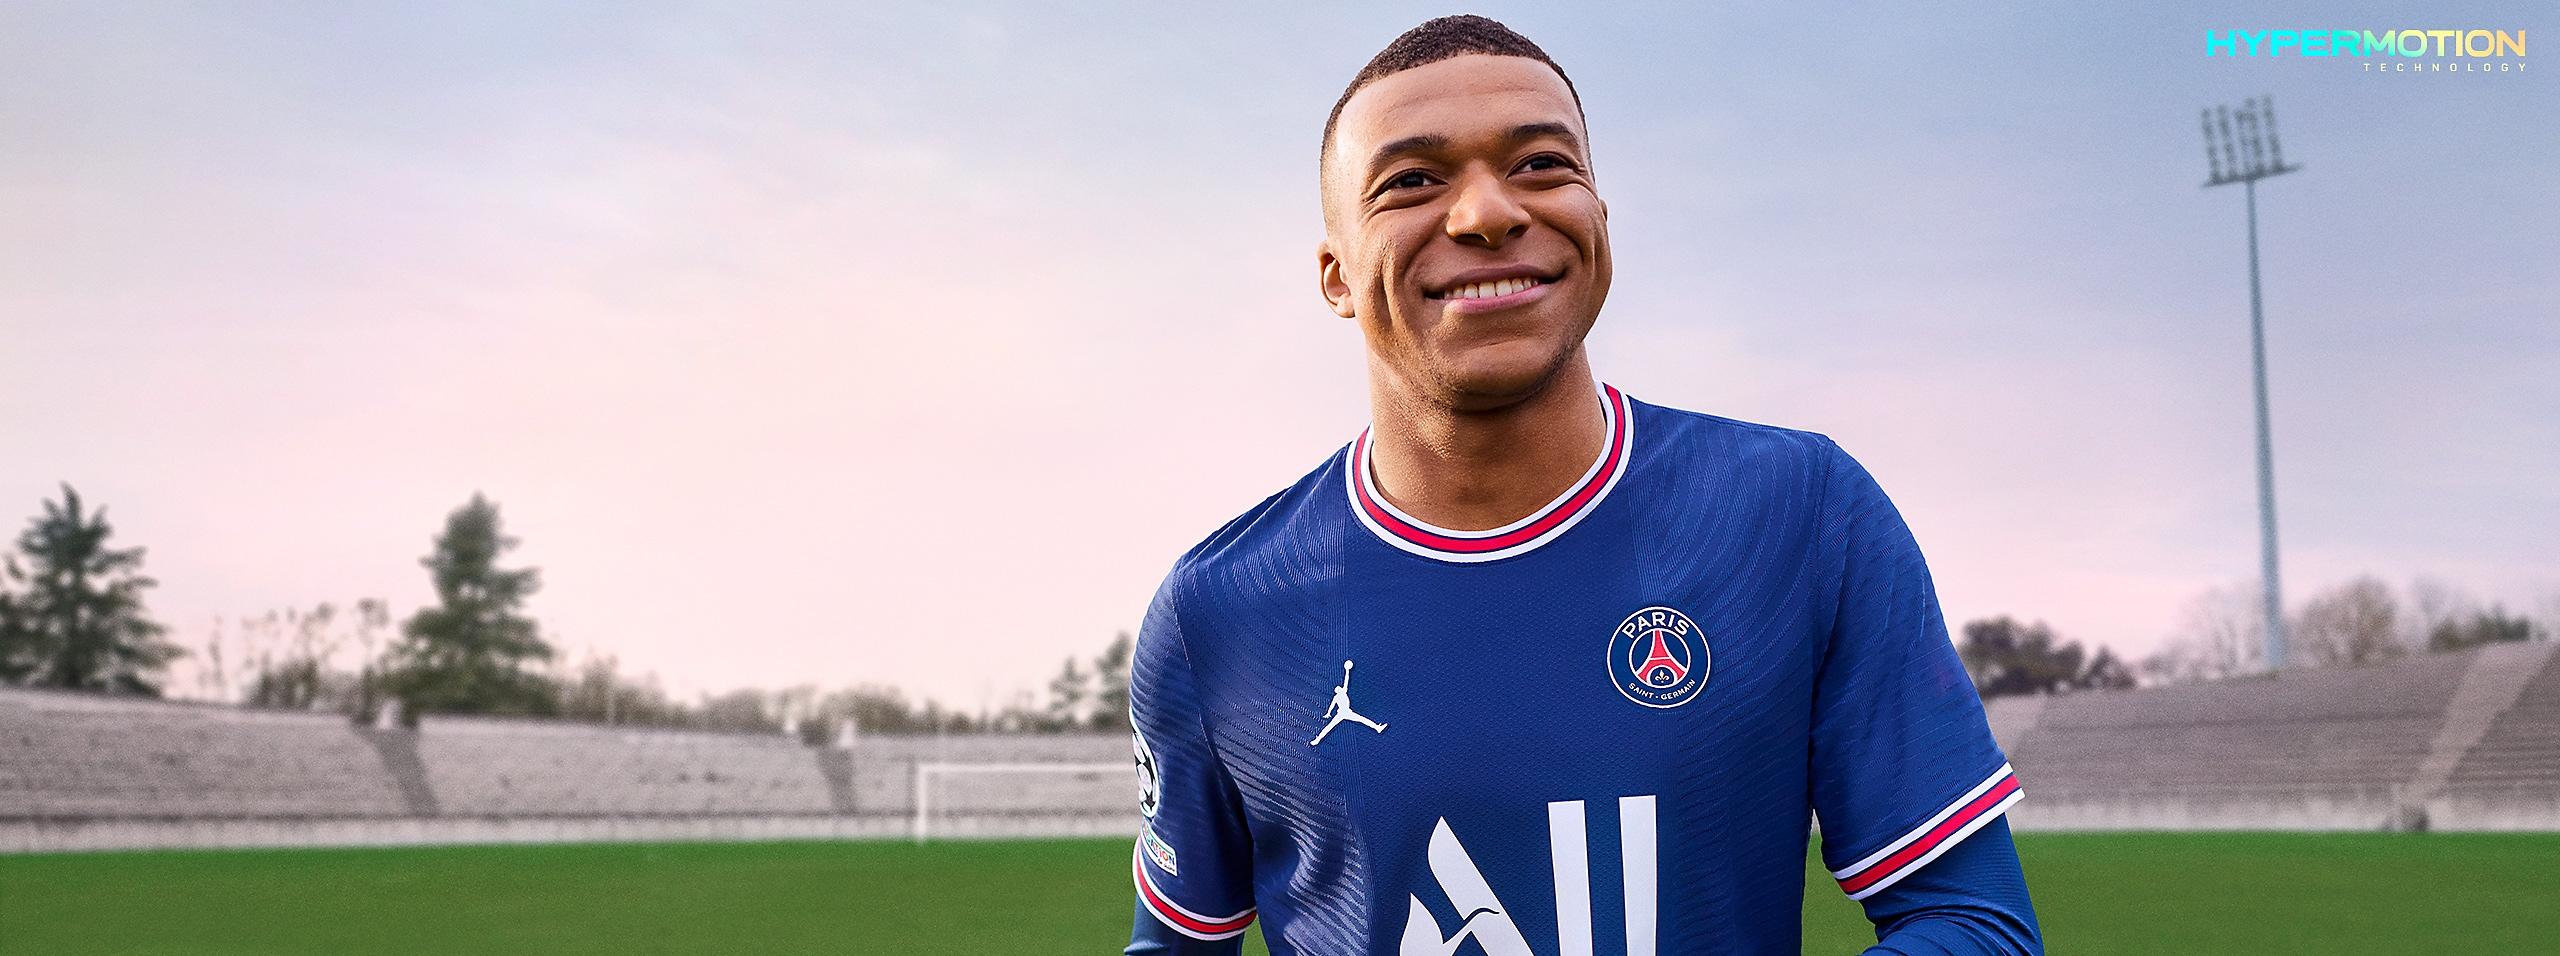 EA SPORTS FIFA 22: Standard Edition - Key Art